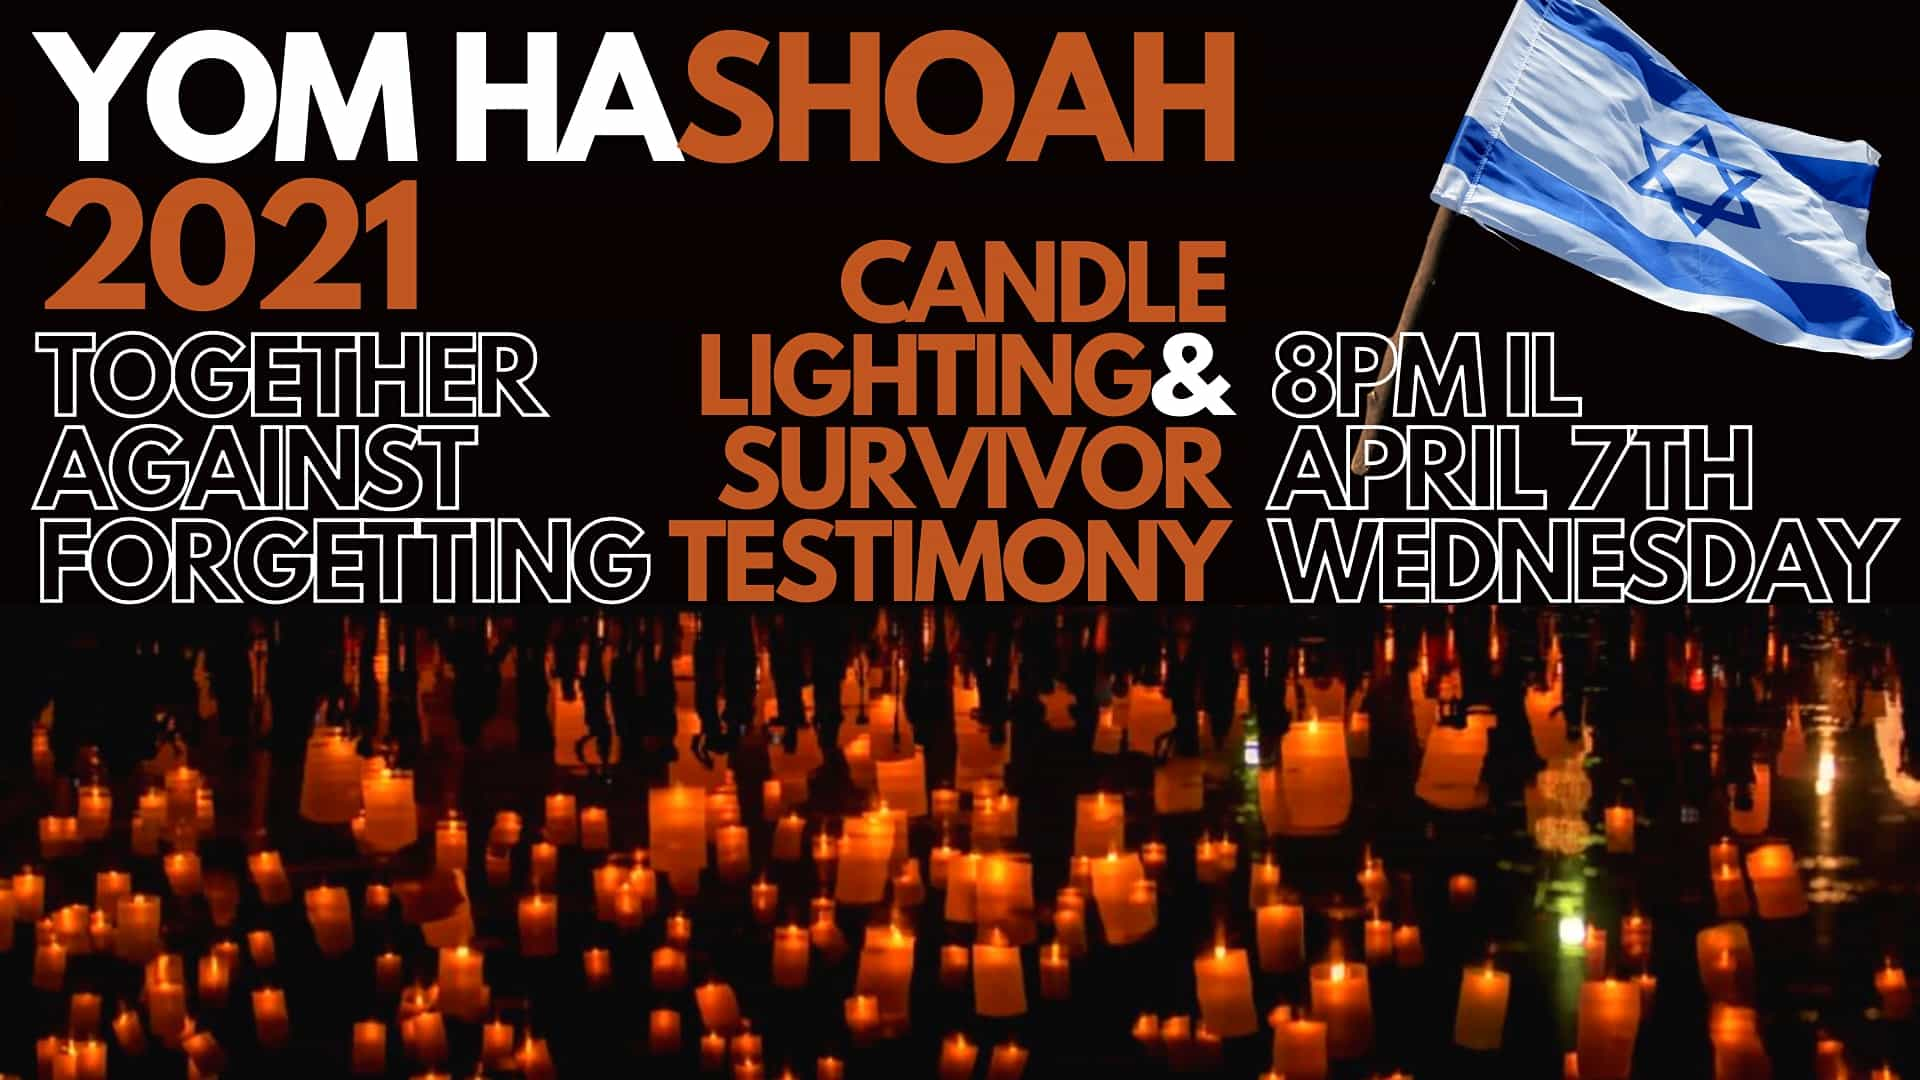 Yom HaShoah Global: Holocaust Survivor Testimony & Candle Lighting, April 7